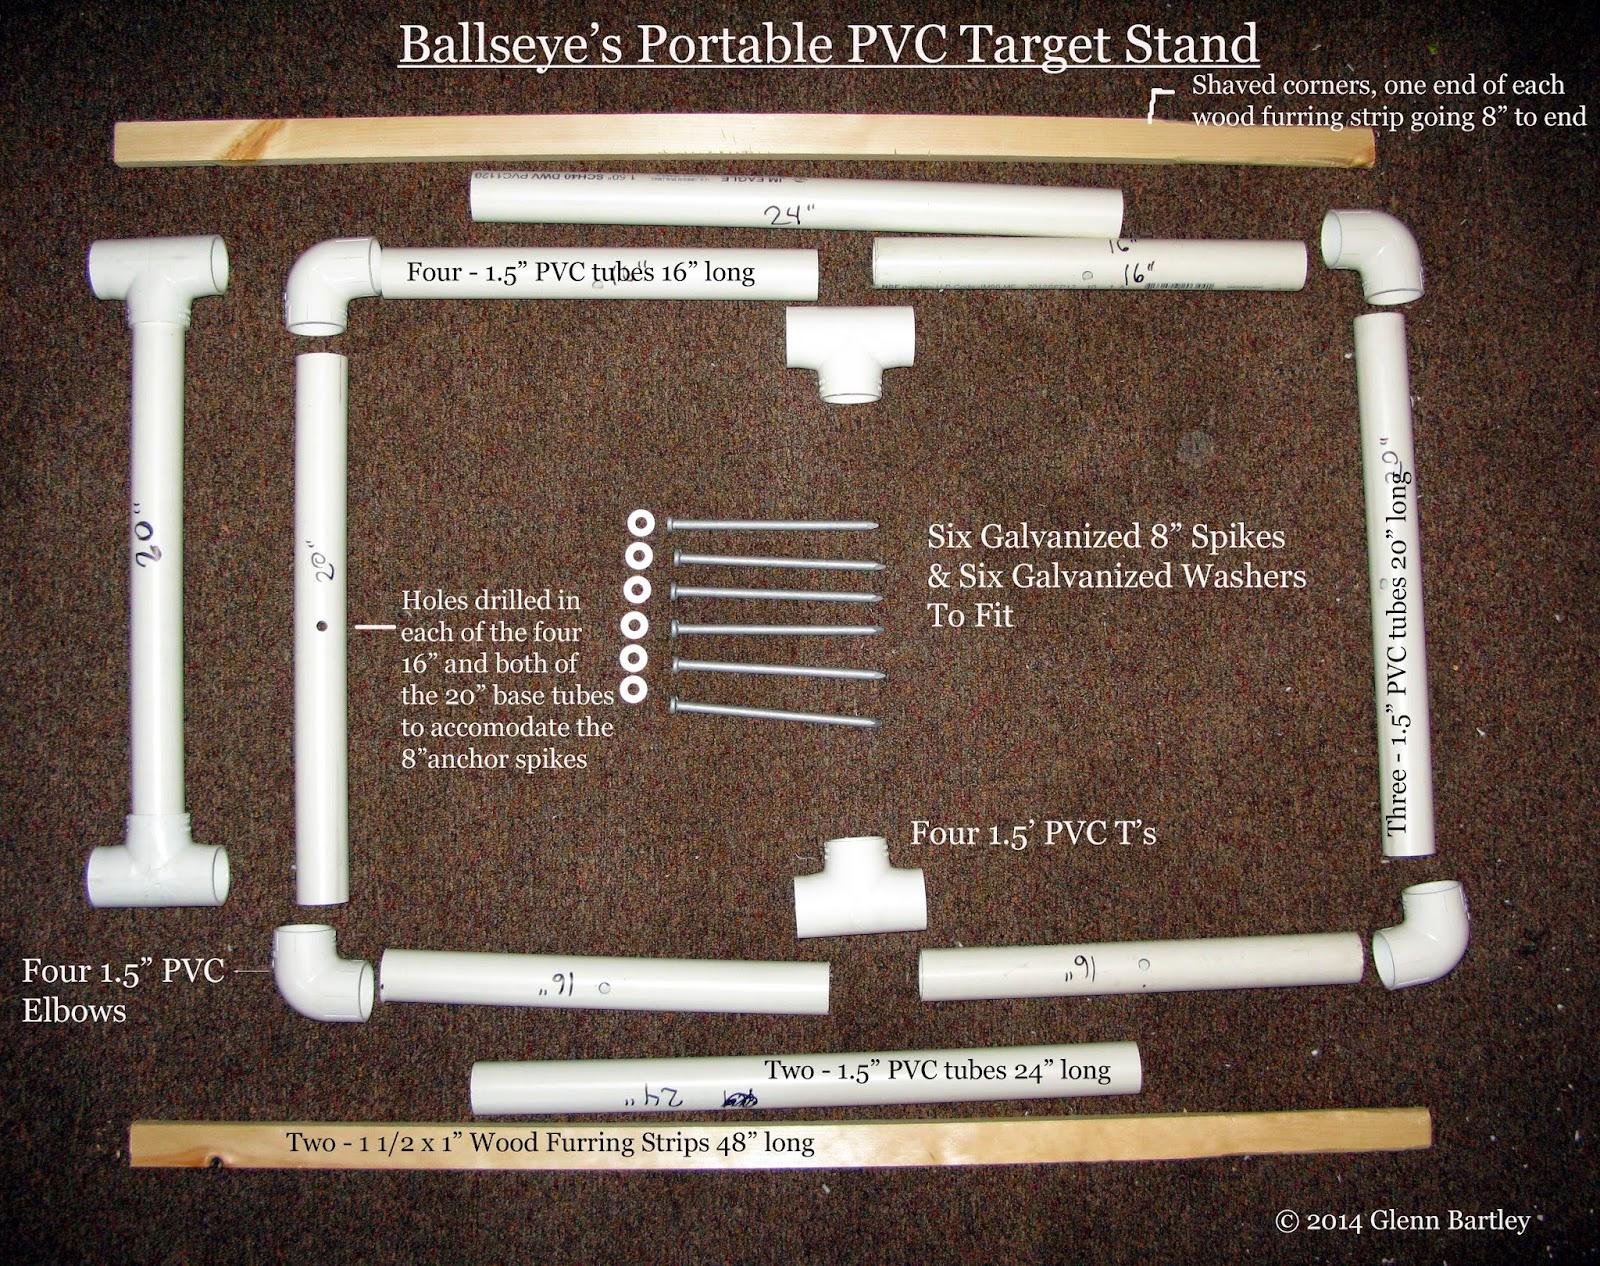 ... -target-stand-ballseye-s-poirtable-pvc-target-stand-diagram-copy.jpg